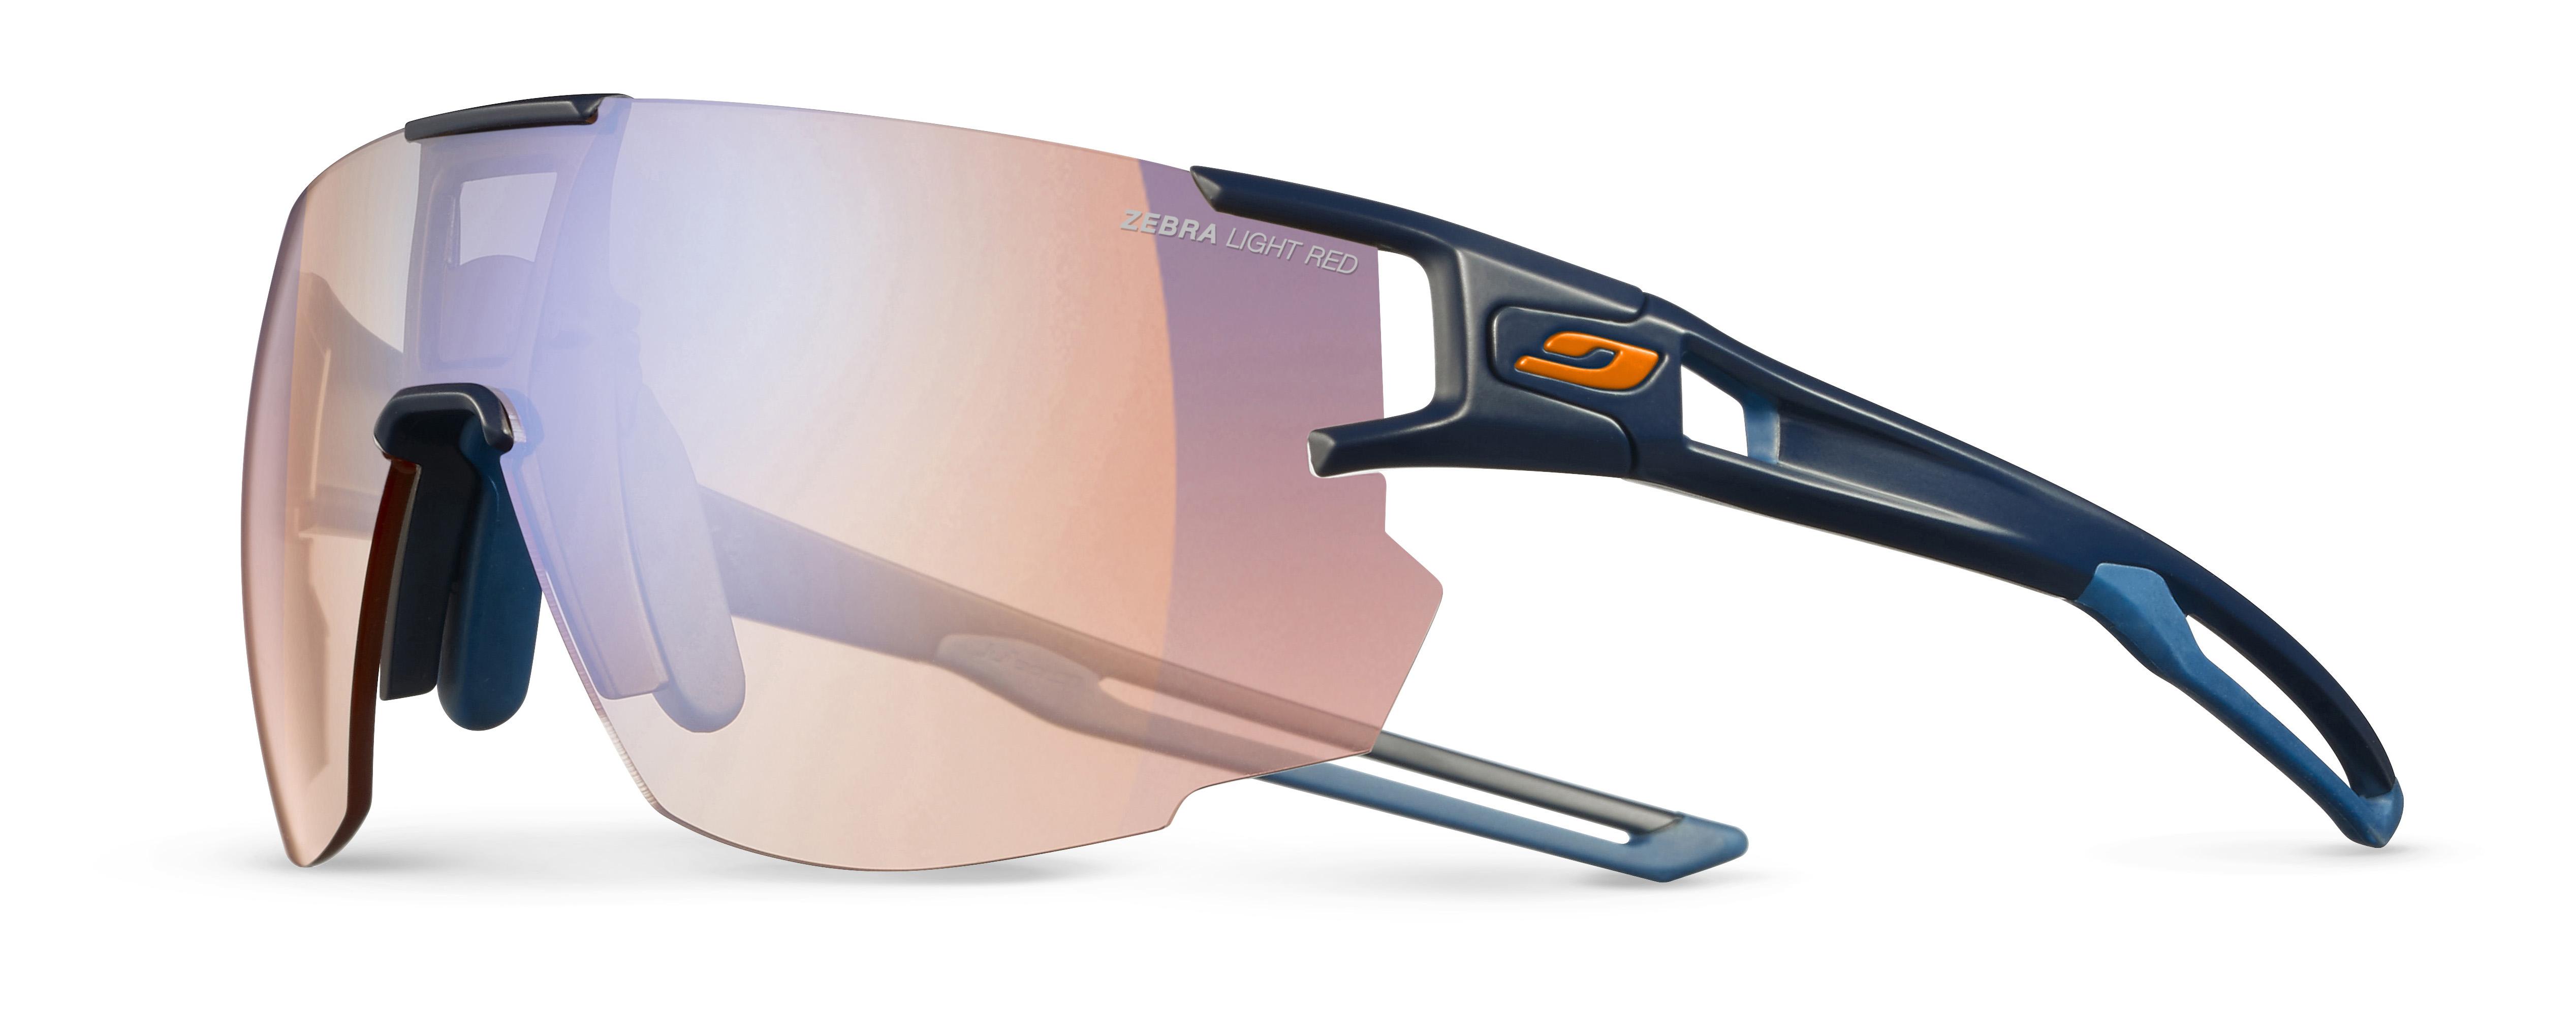 Image of   Julbo Aerospeed Zebra Light Red Sunglasses - Dark Blue / Dark Blue / Orange